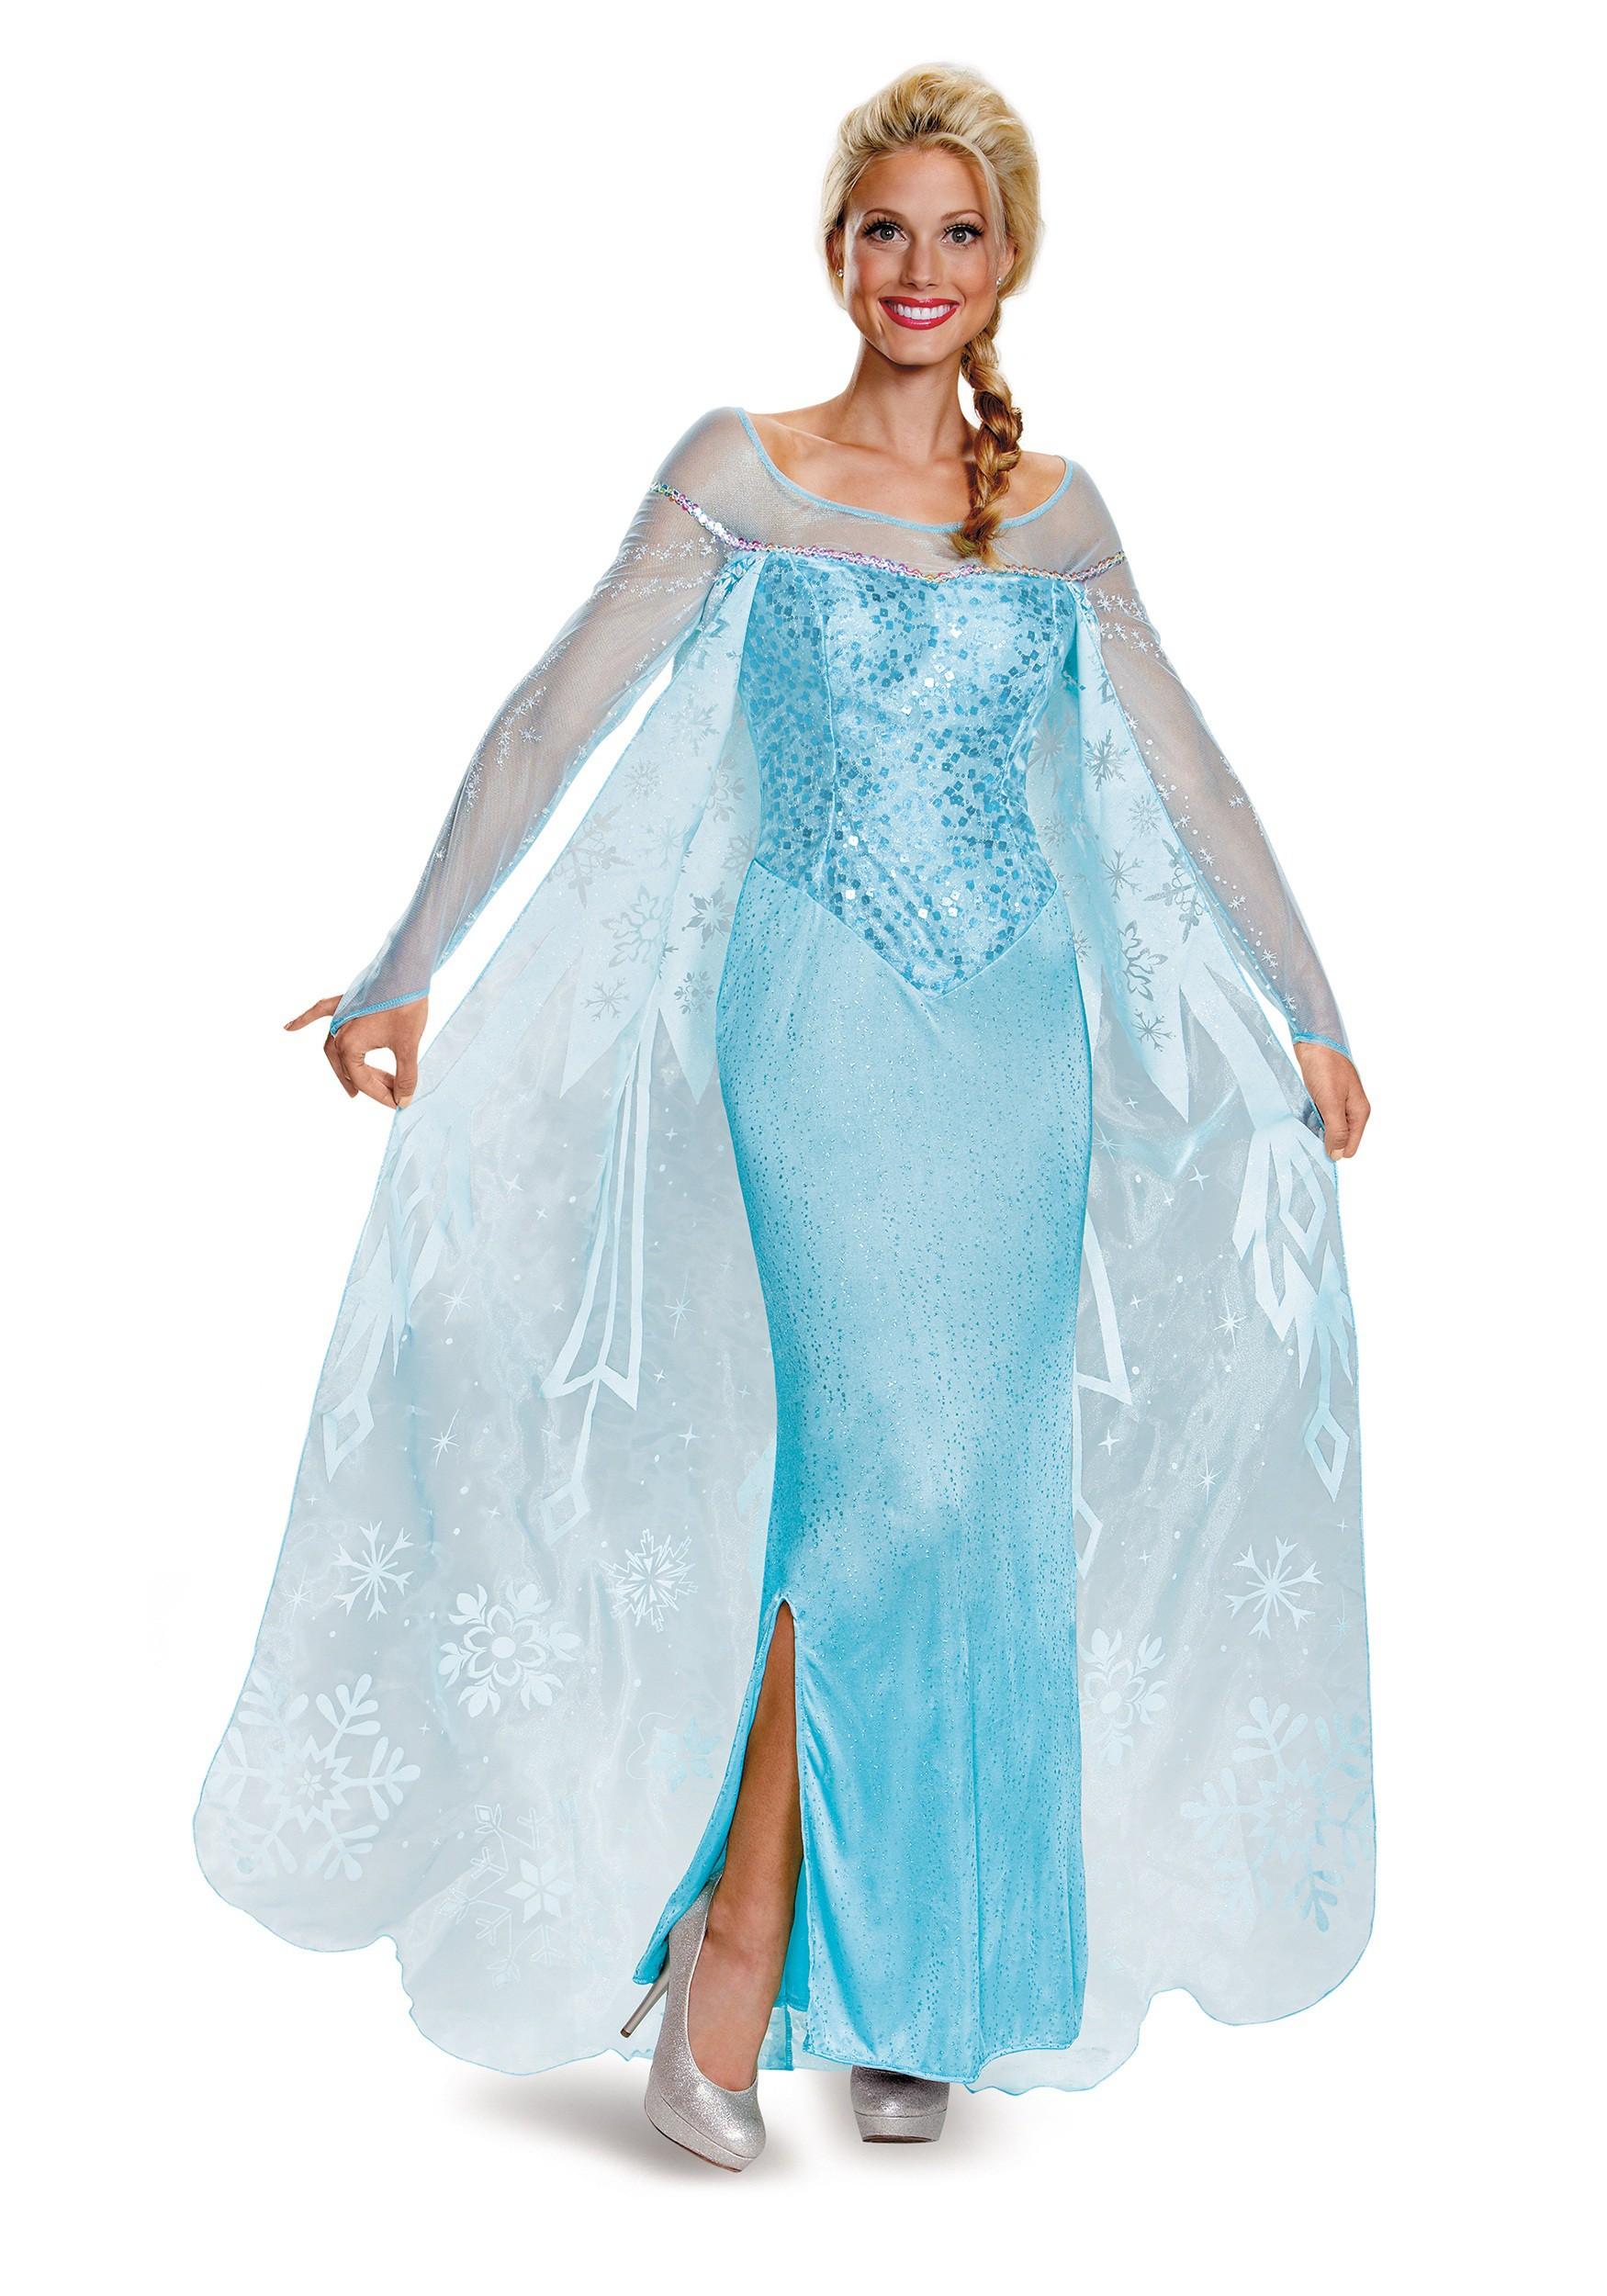 Frozen Elsa Prestige Adults Costume